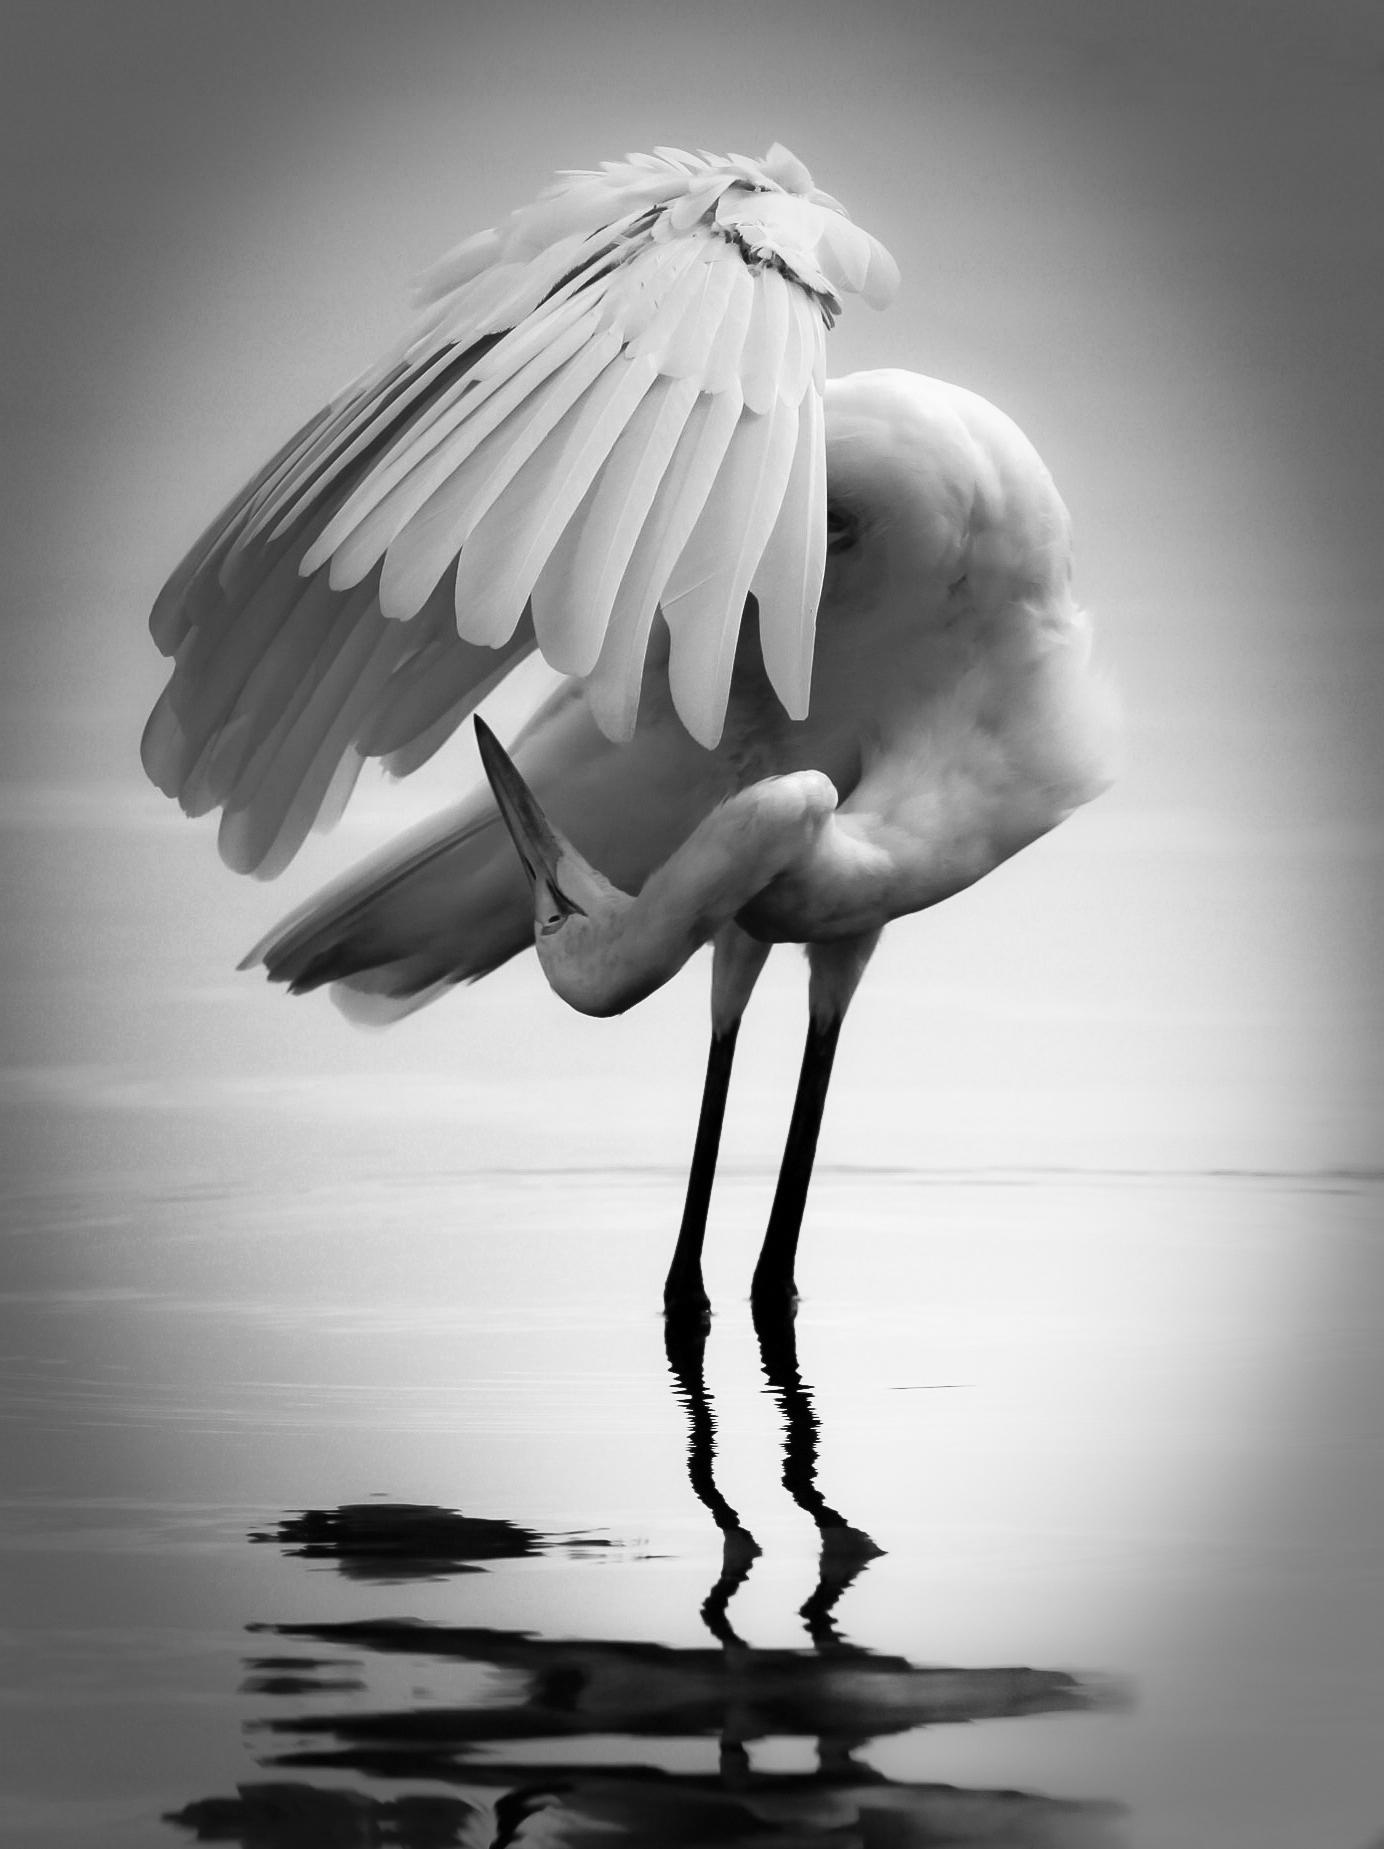 Black And White Photography Award Winning